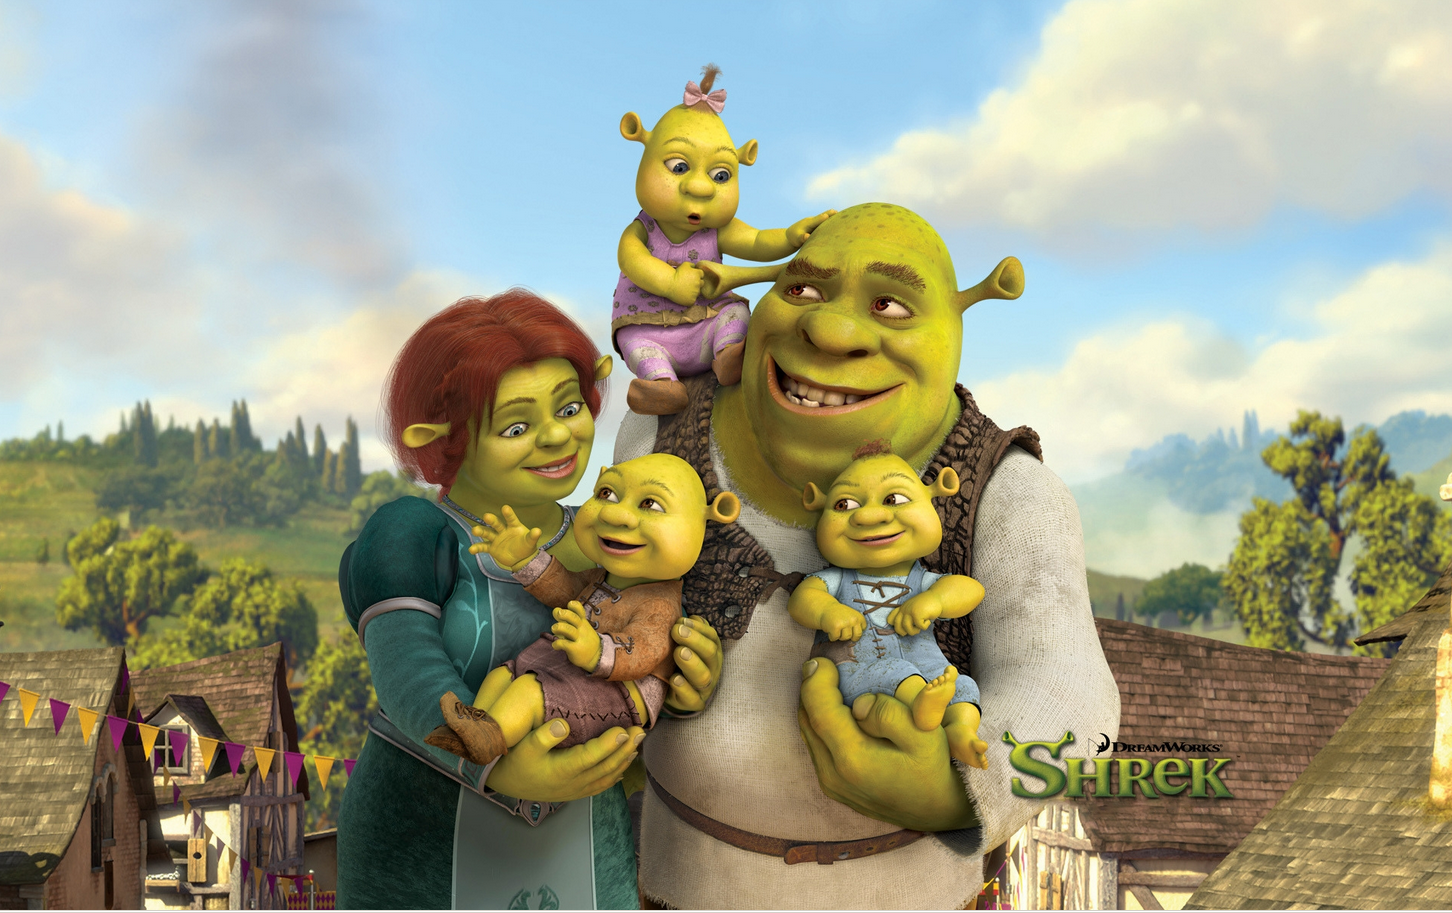 Http 7 Themes Com 6868643 Shrek Wallpaper Html Shrek Animated Movies Disney